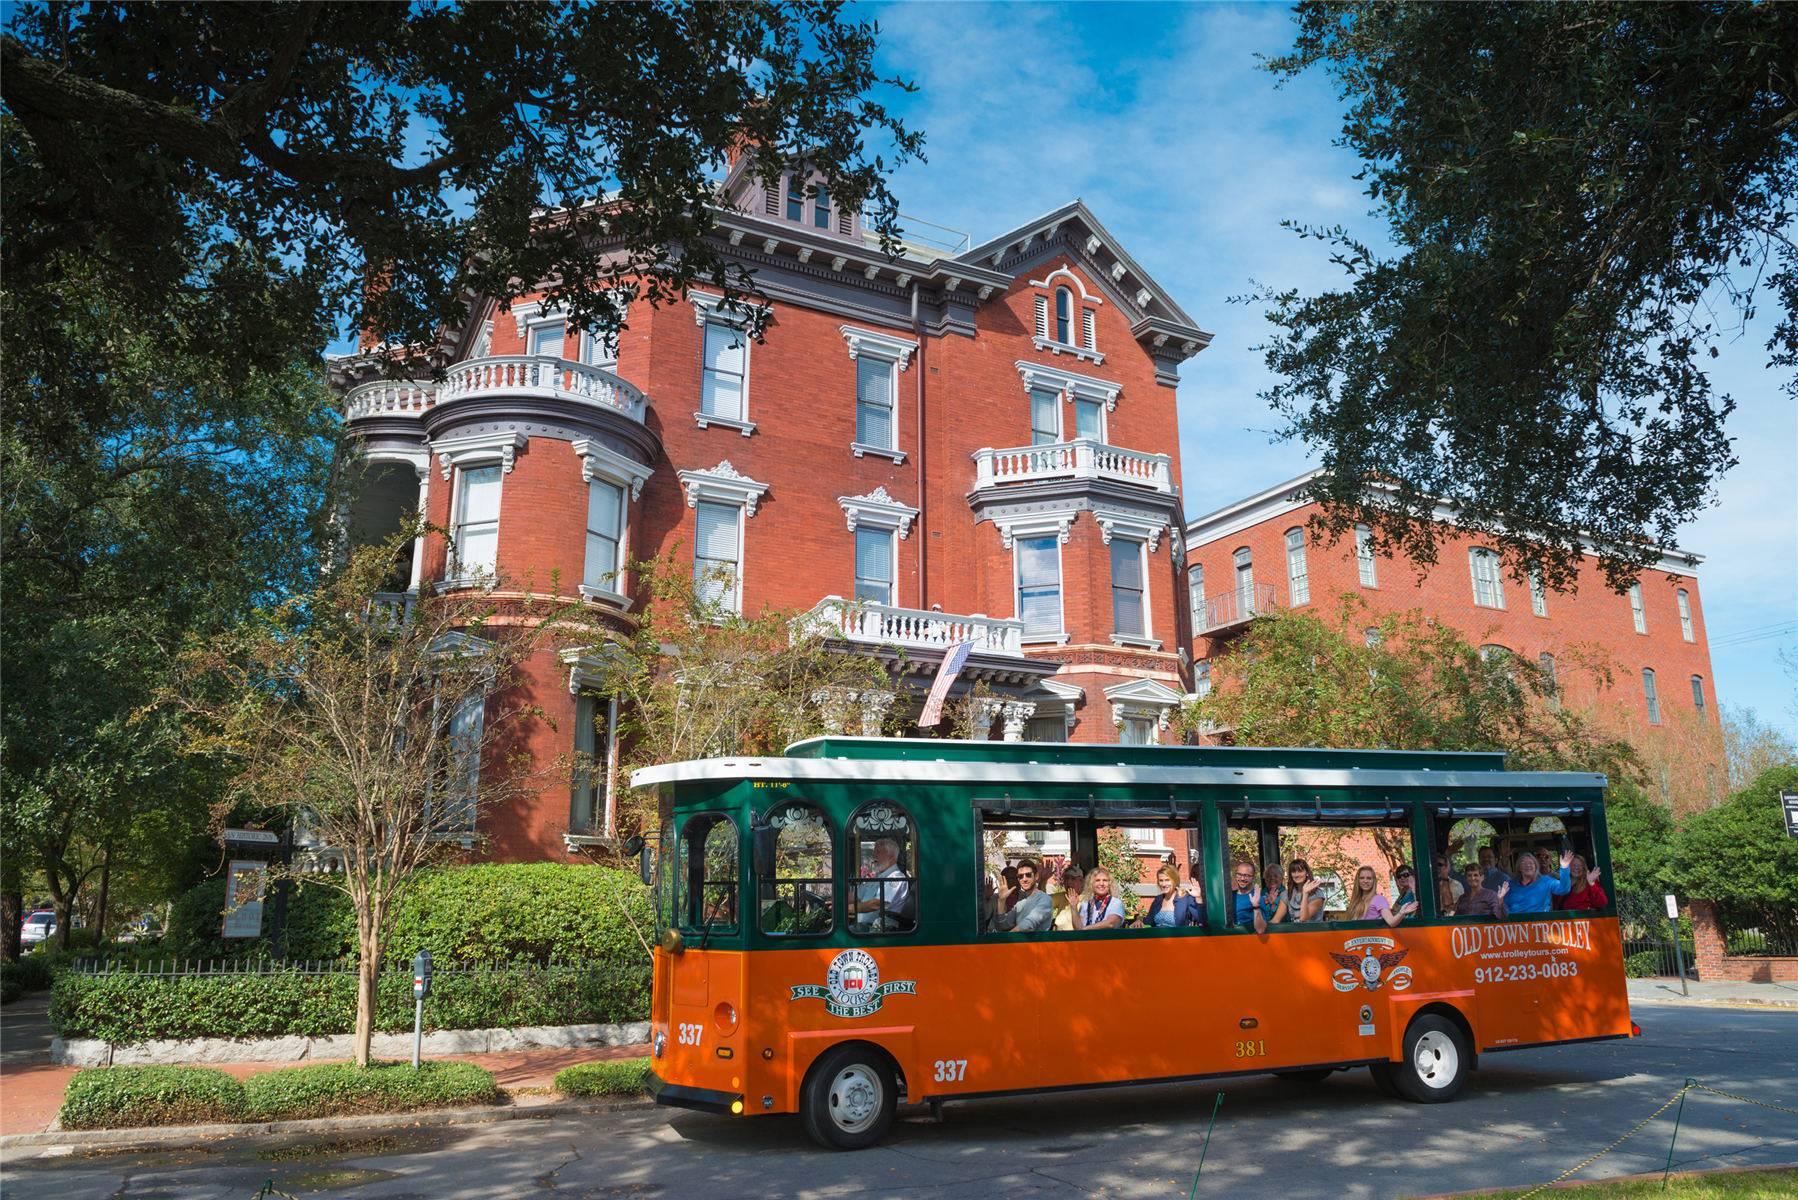 Old Town Trolley Tour of Savannah - Tours4Fun